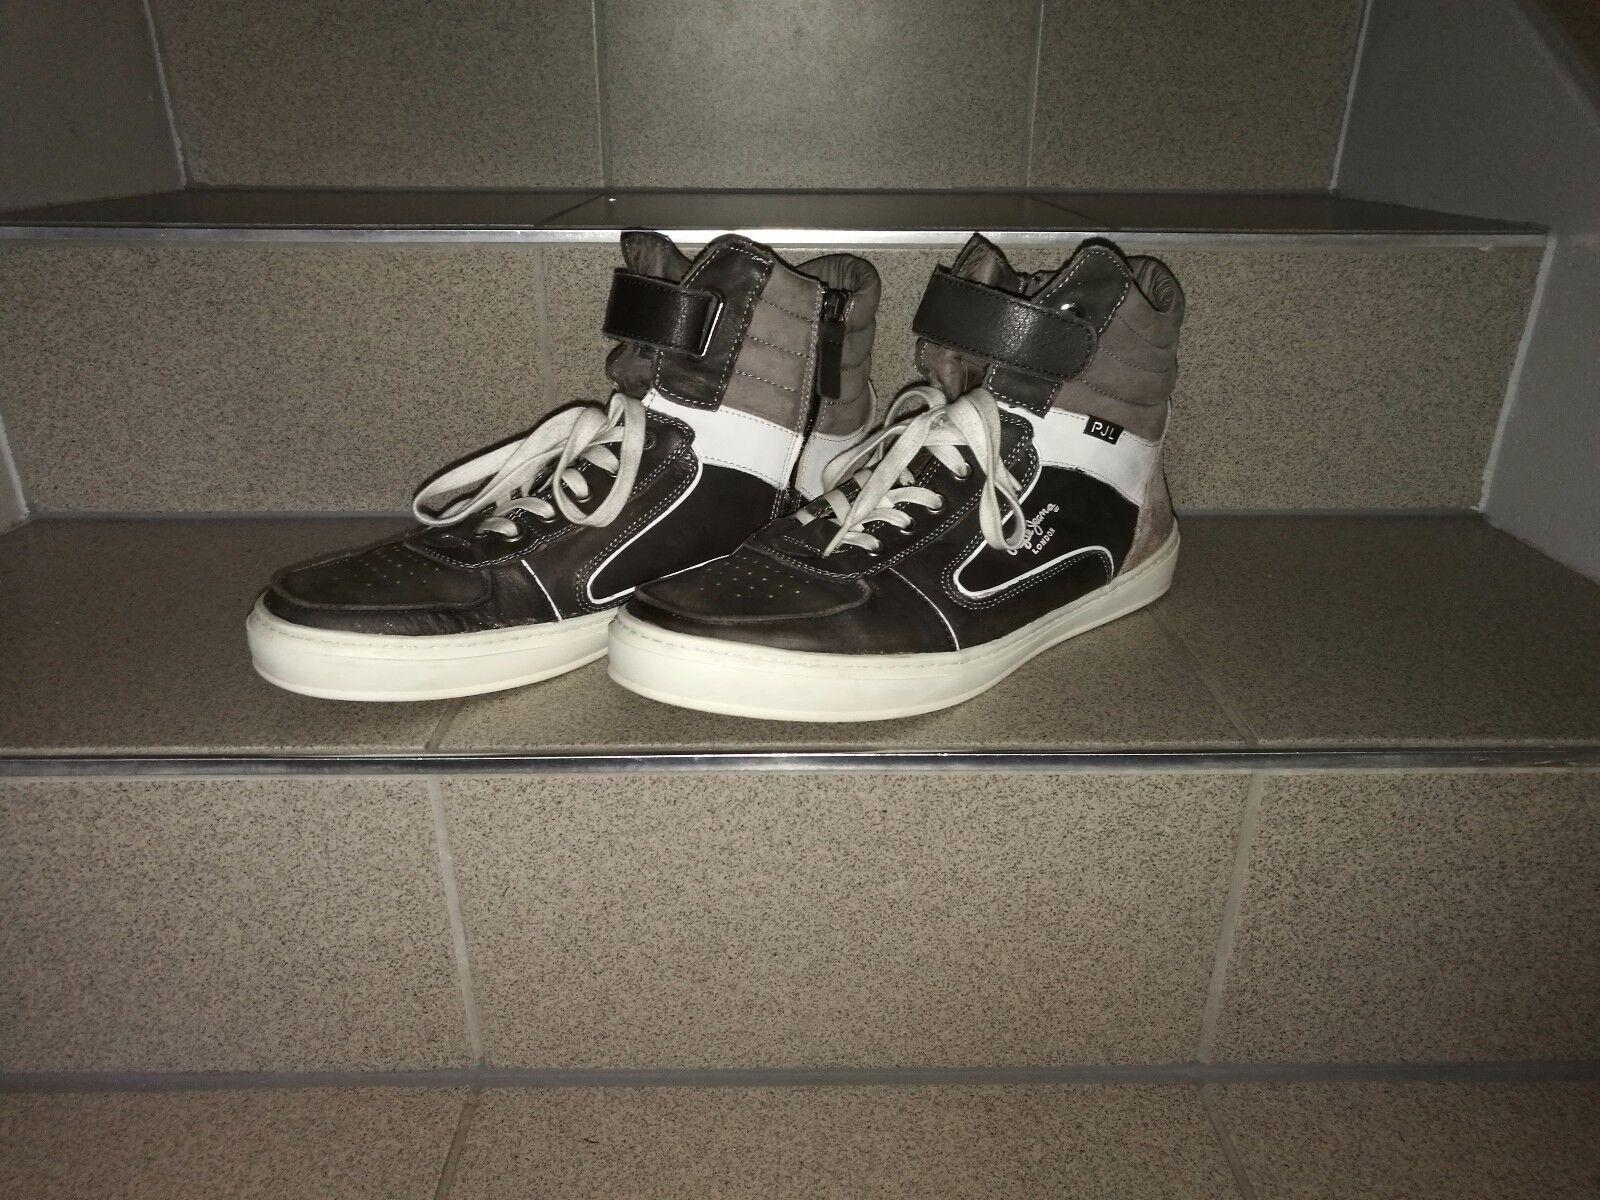 Pepe Jeans Sneaker Herren Gr. Neu 45, echtes Leder wie Neu Gr. 974ec4